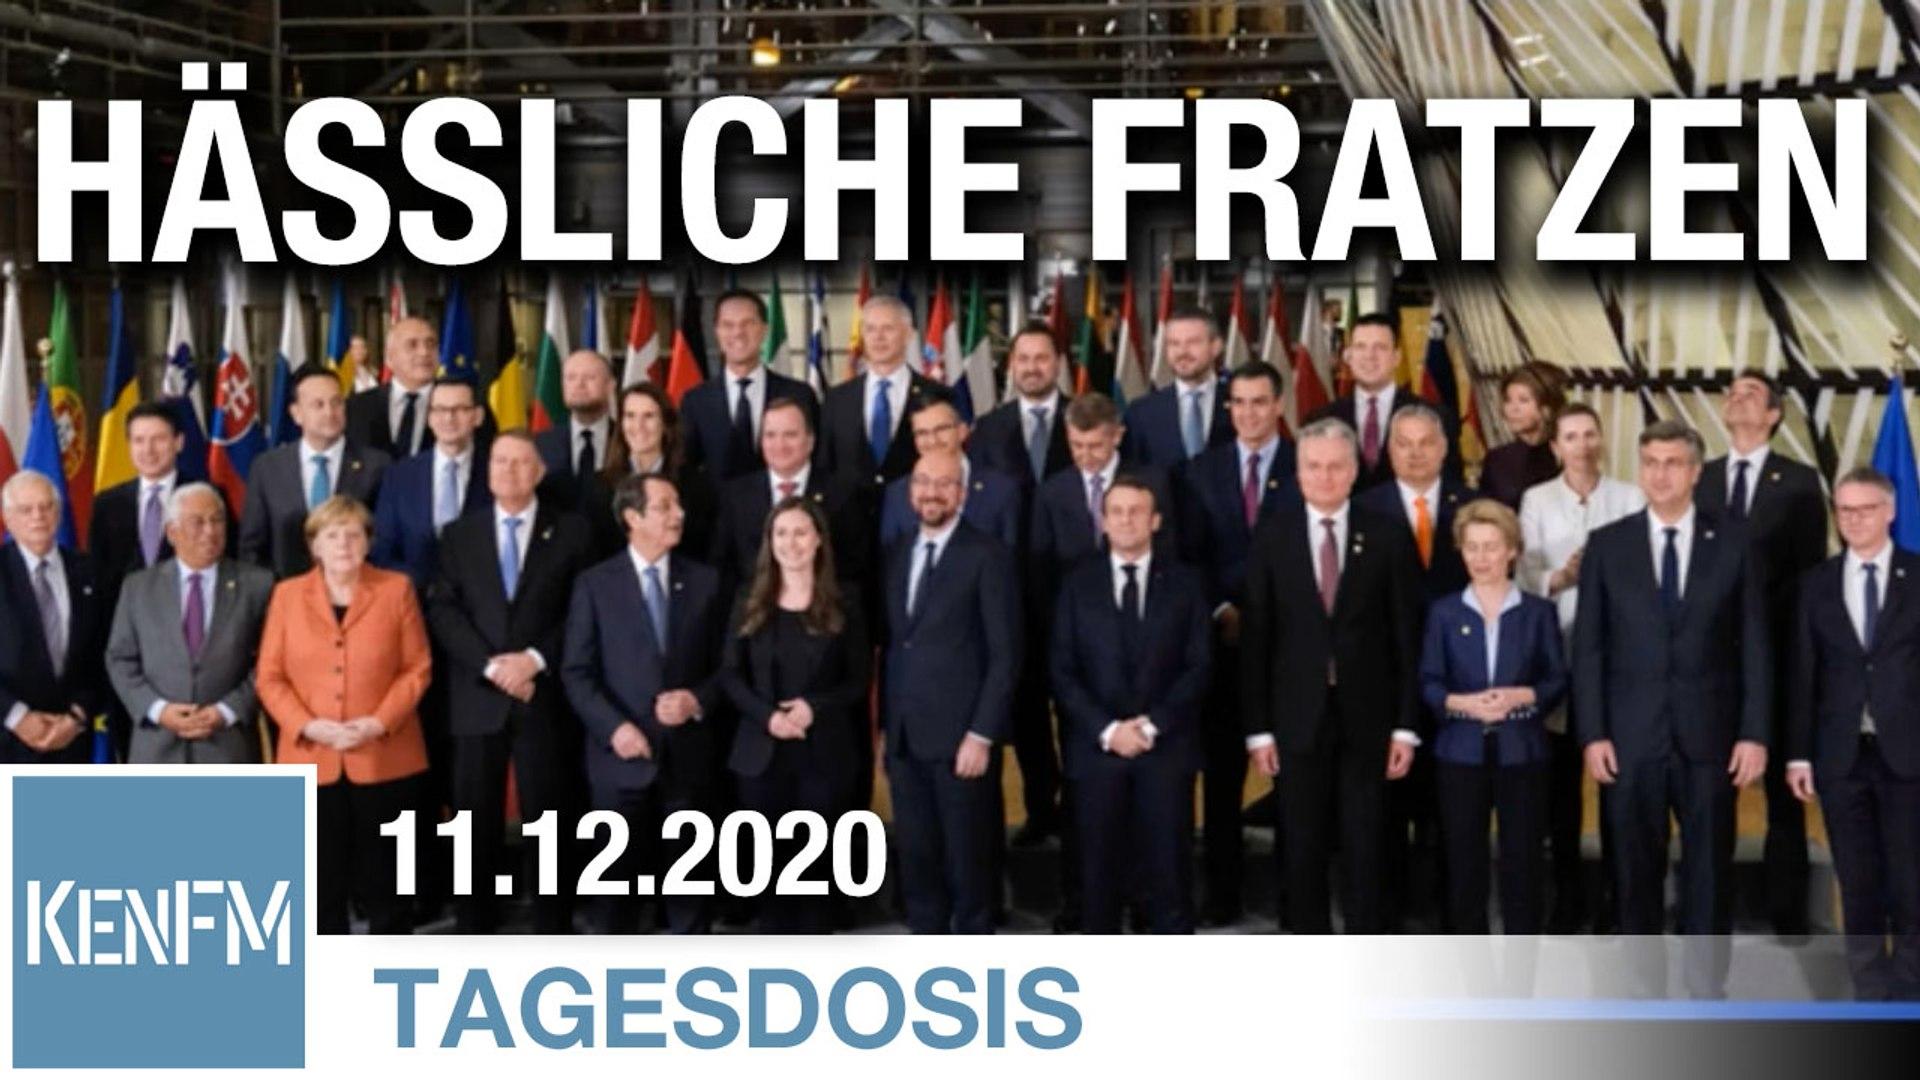 Hässliche Fratzen hinter frommem Antlitz der EU-Menschenrechtsritter